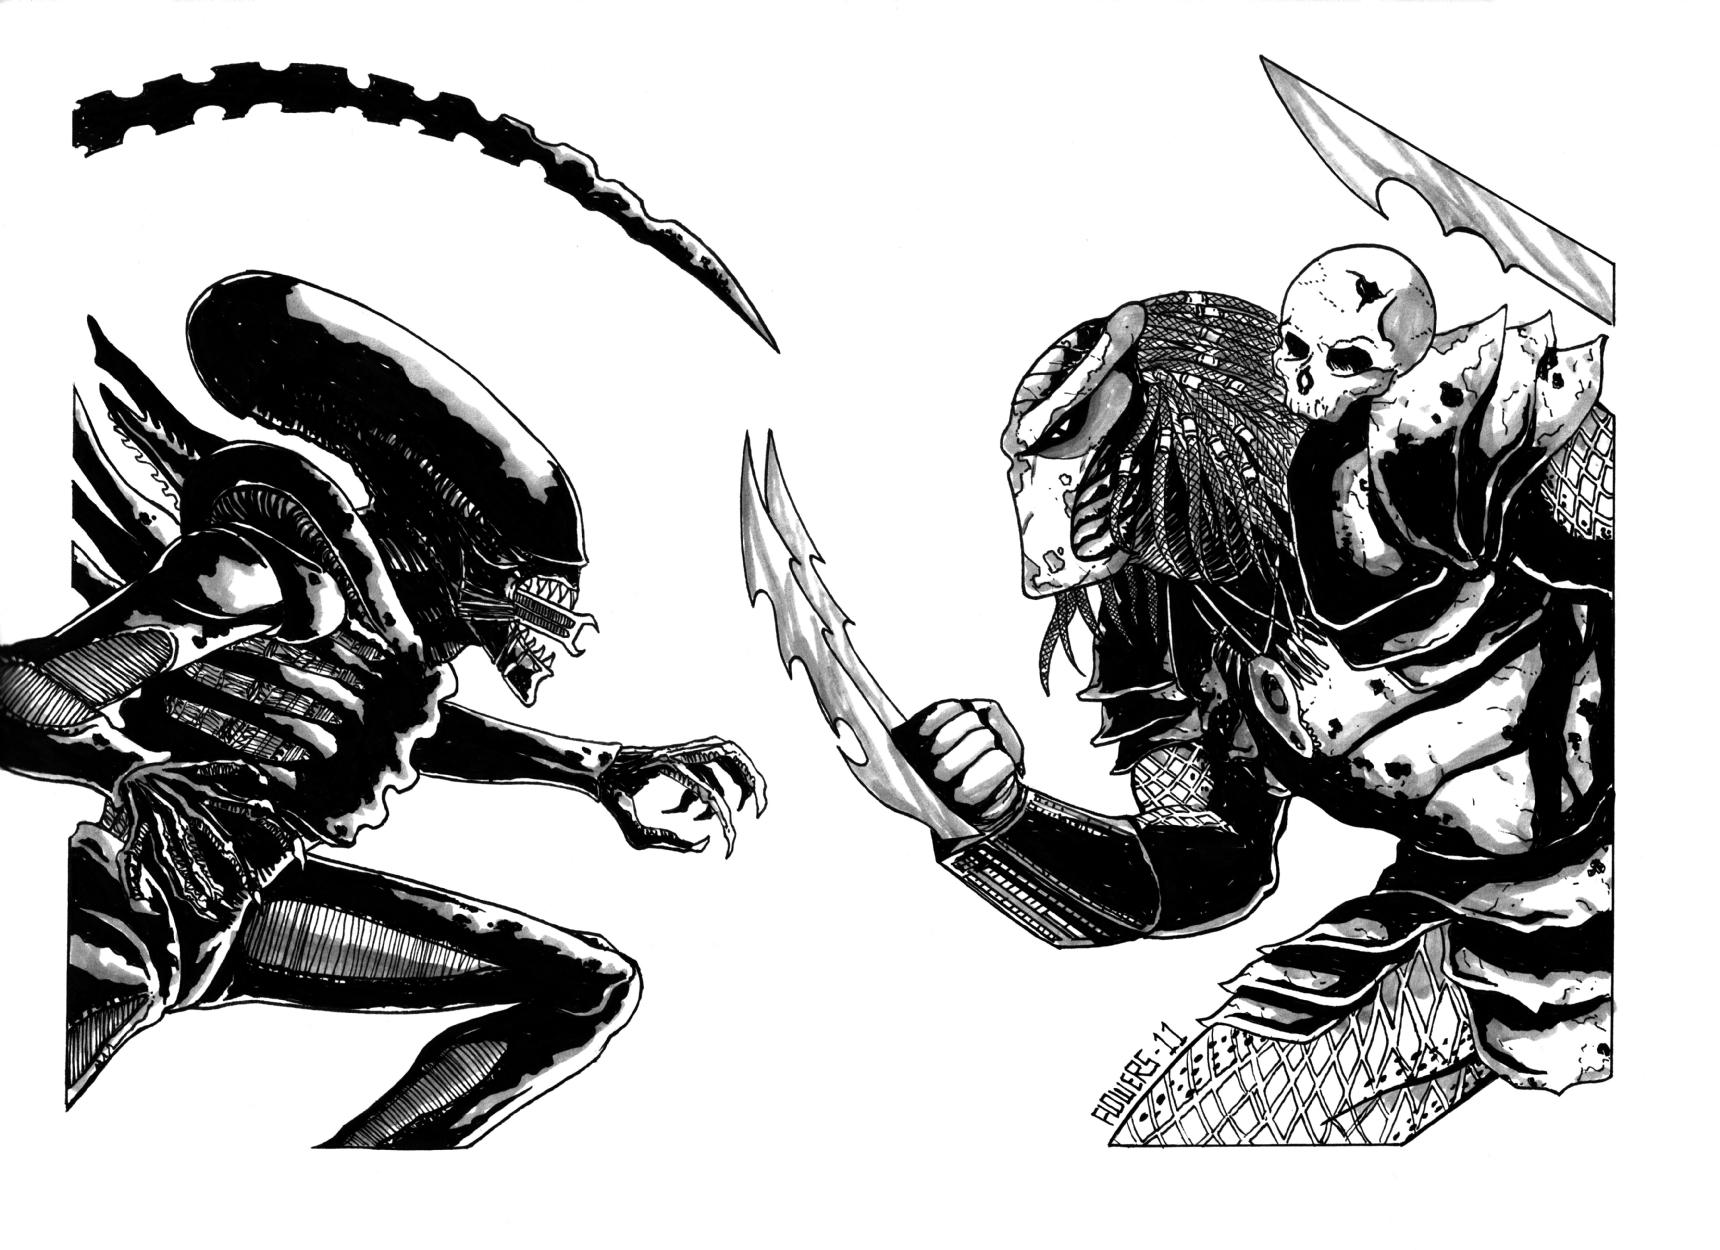 Alien Versus Predator Coloring Pages